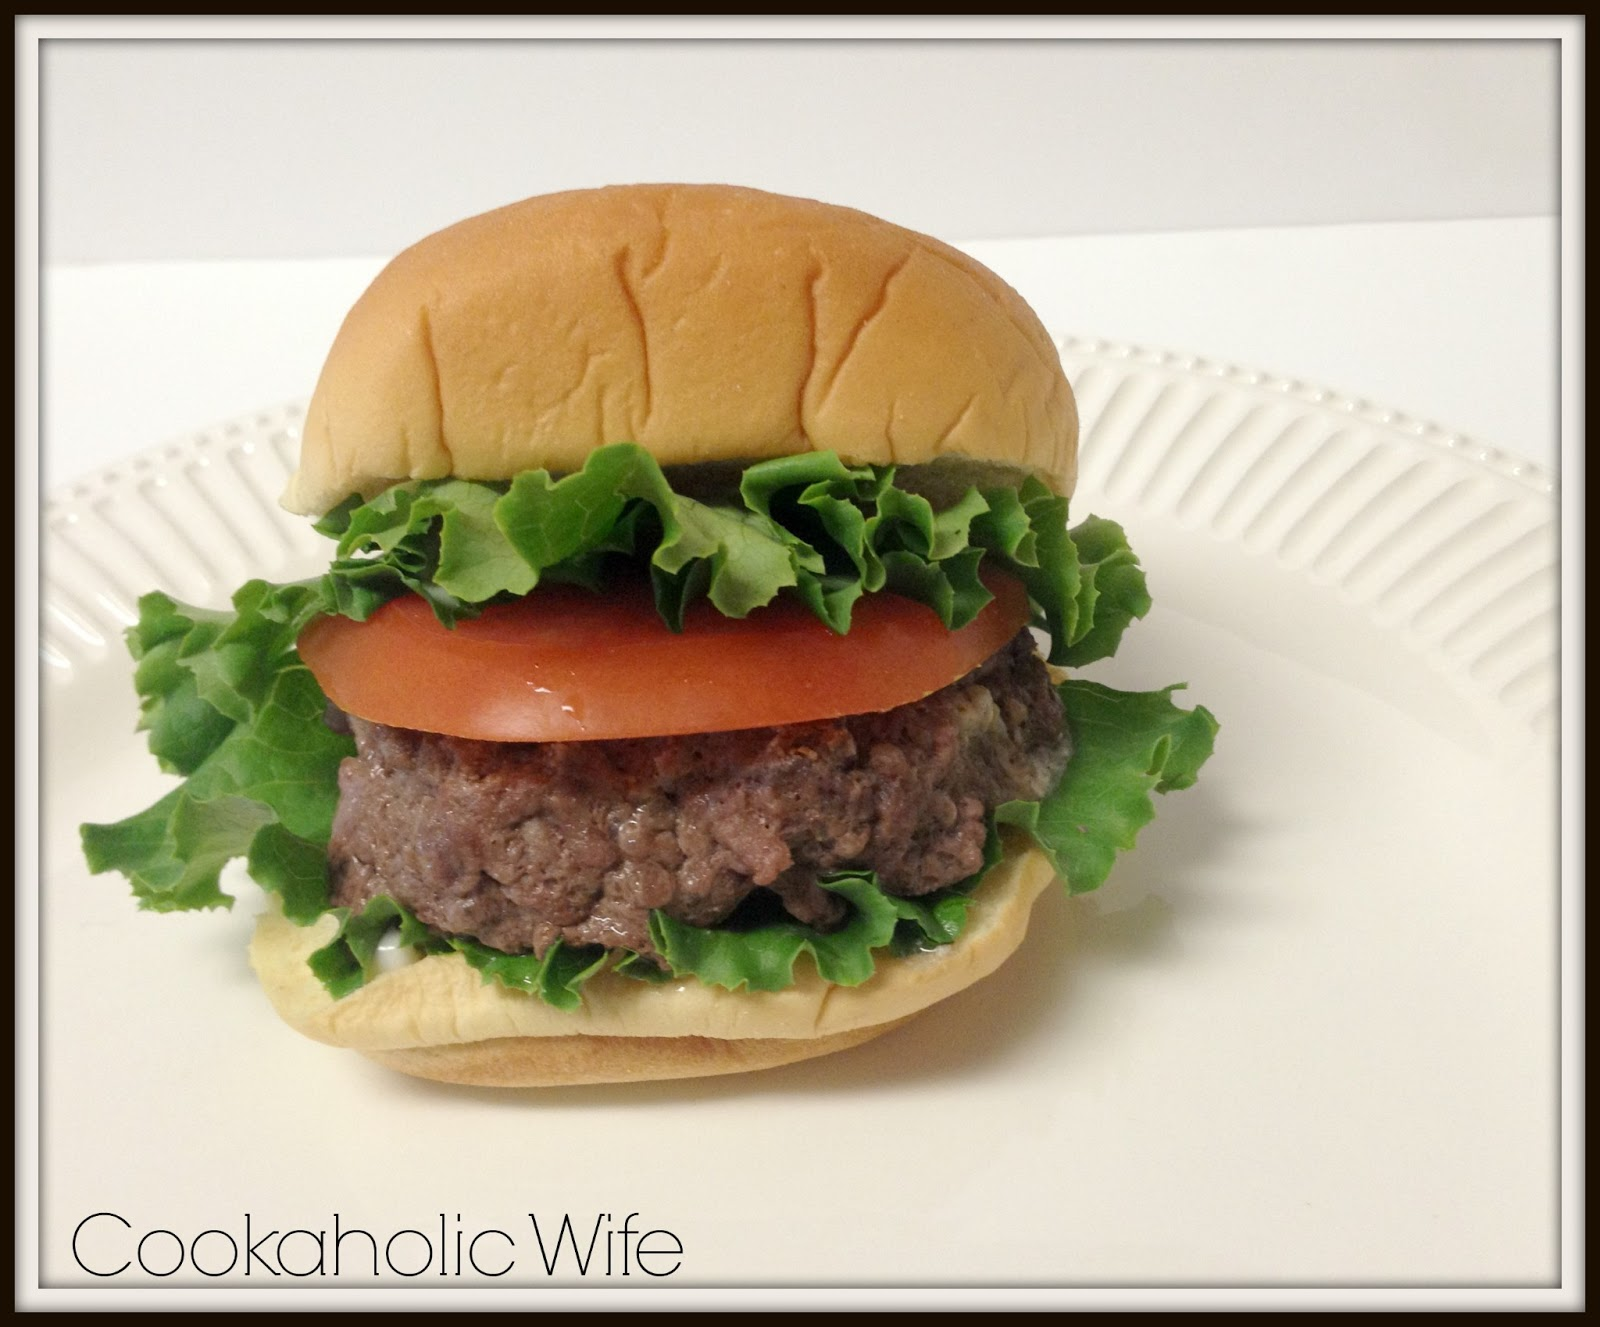 Cookaholic Wife: Blue Cheese Stuffed Burgers